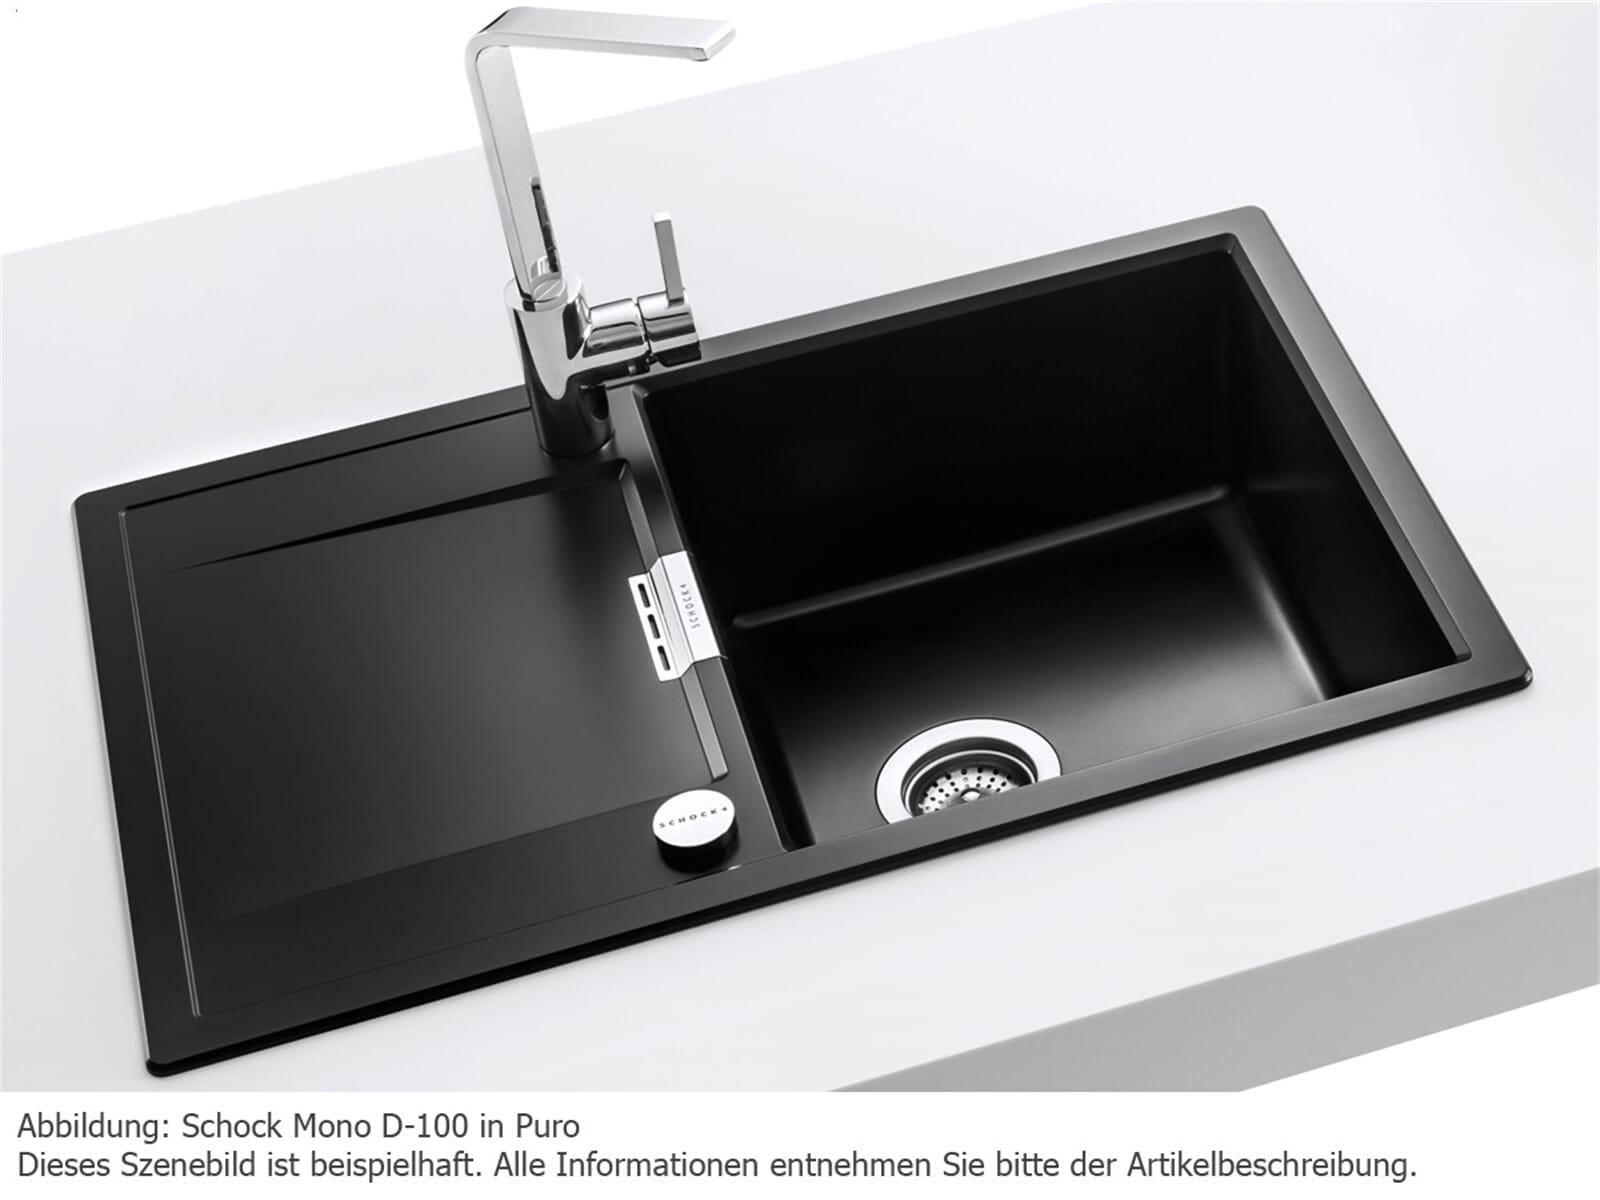 schock mono d 100 a puro granitsp le ebay. Black Bedroom Furniture Sets. Home Design Ideas